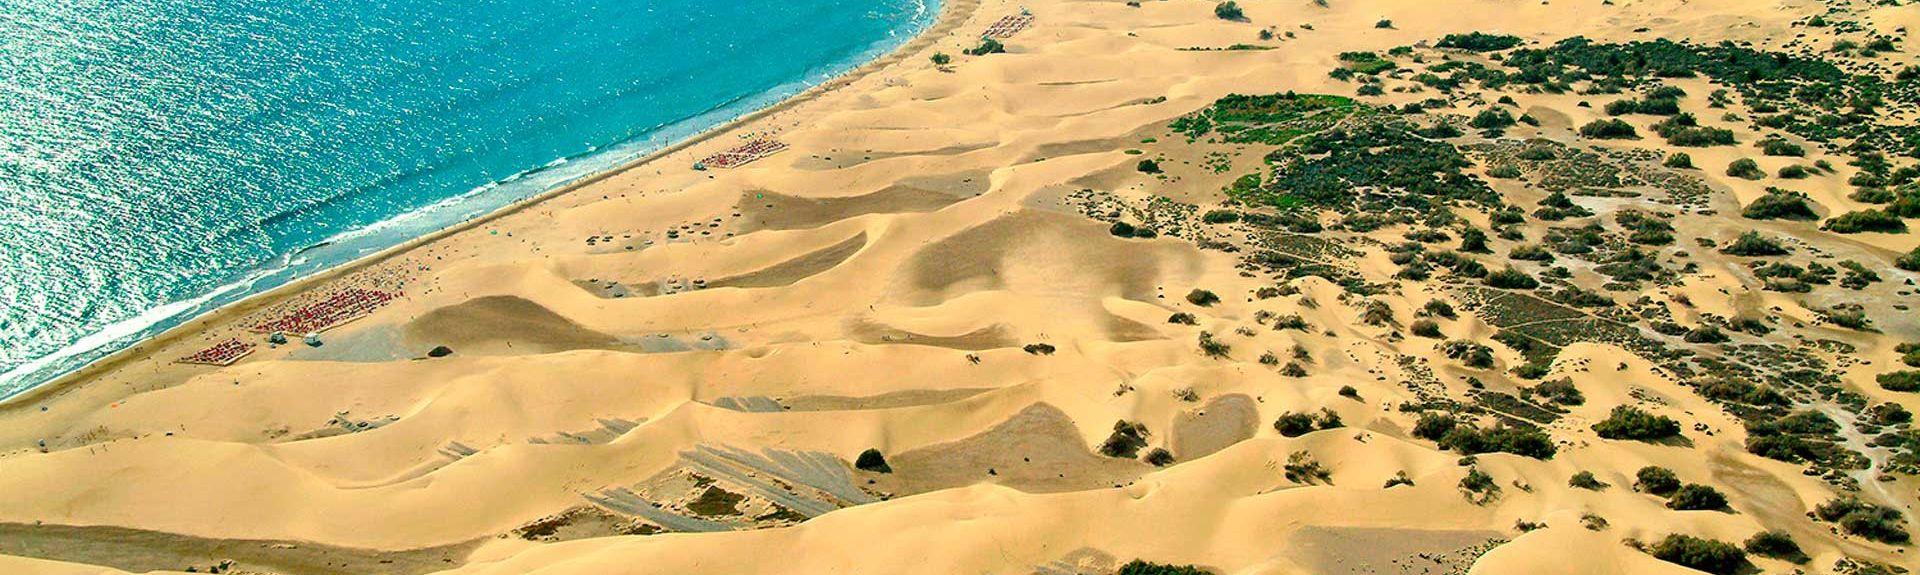 La Playa de Arguineguín, Mogan, Kanariansaaret, Espanja